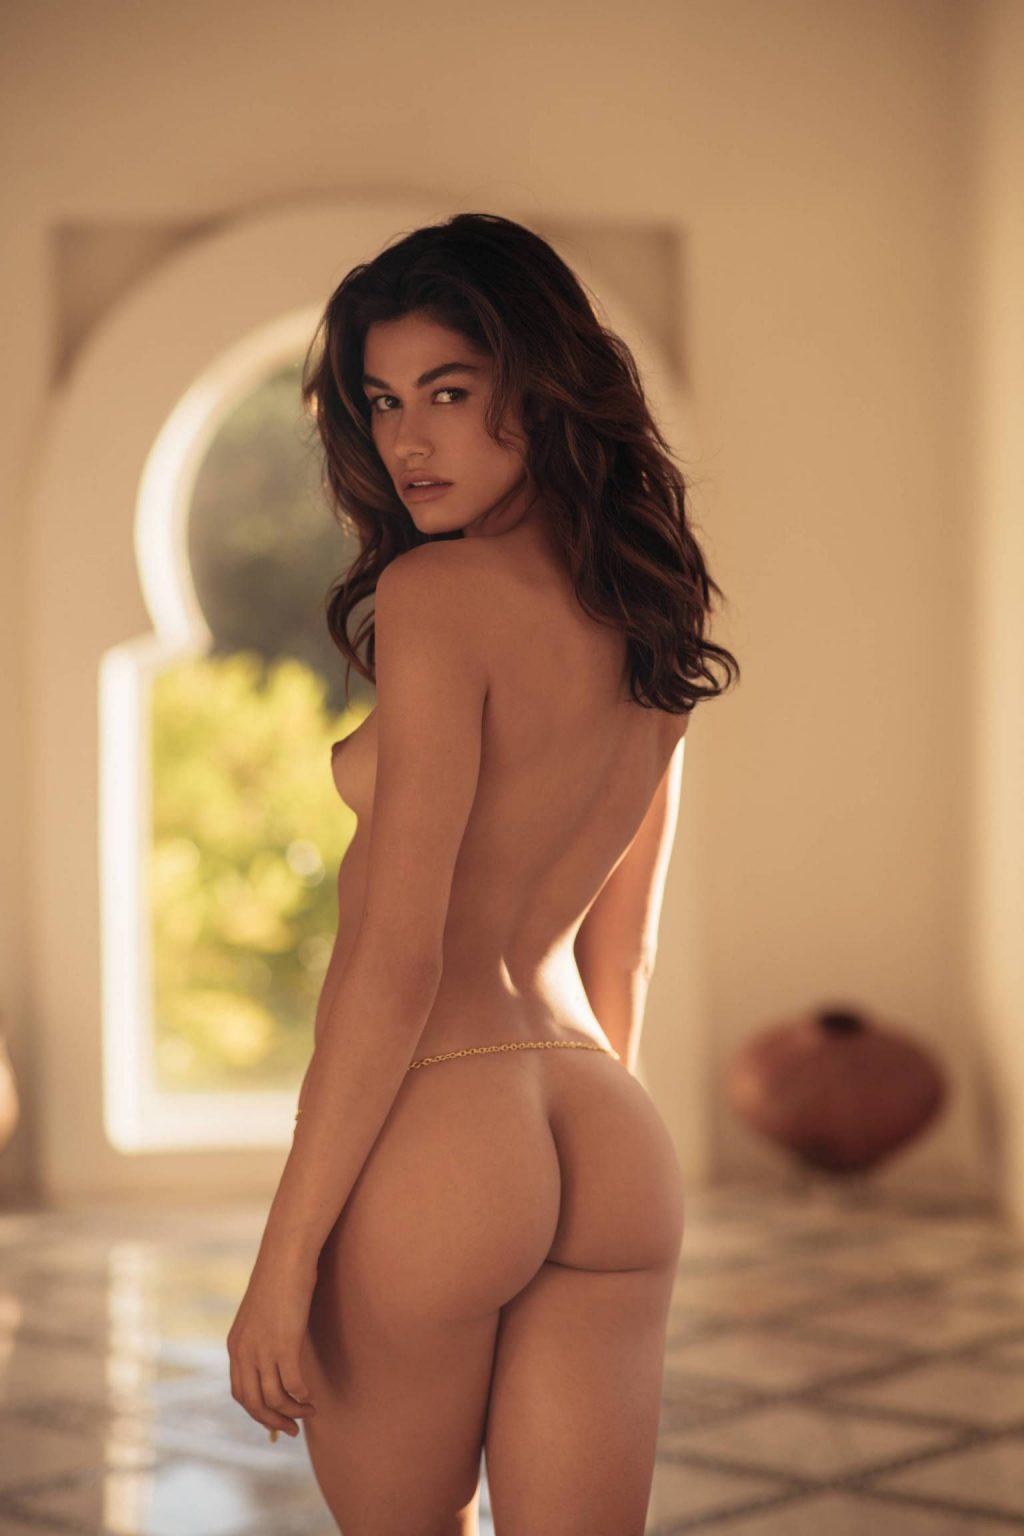 Anett stromberg porn pics and sex photos